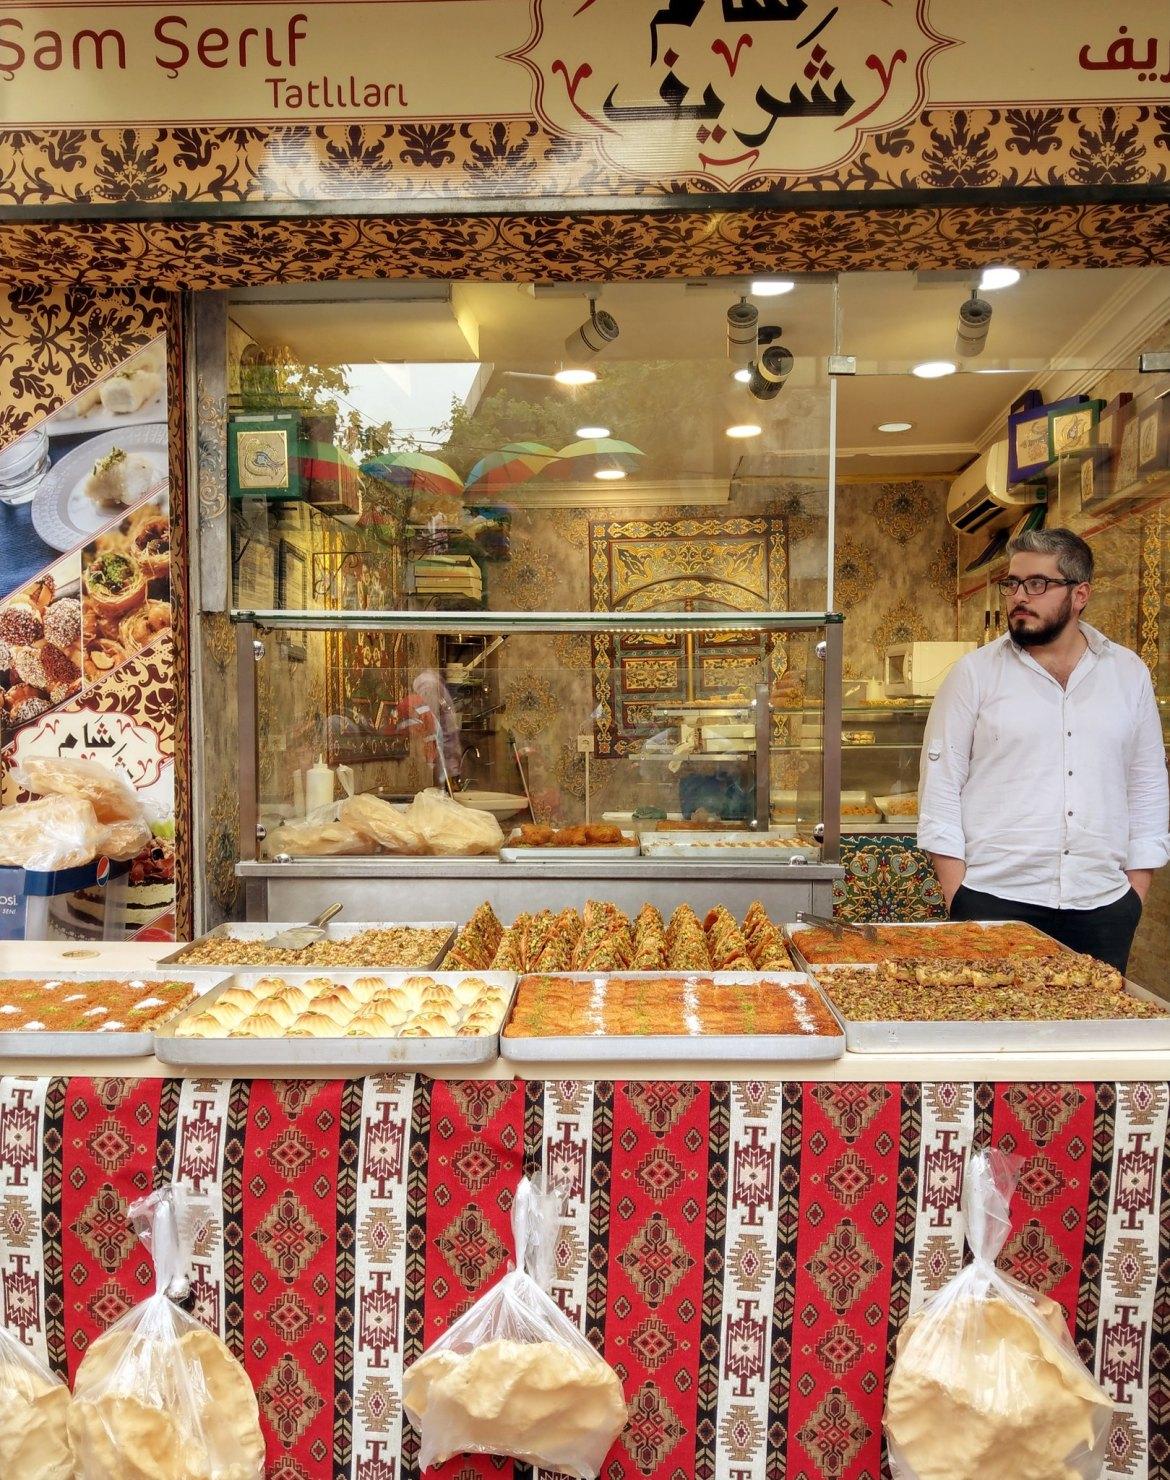 8) Syrian Sweet Shop Fatih Nieghbourhood